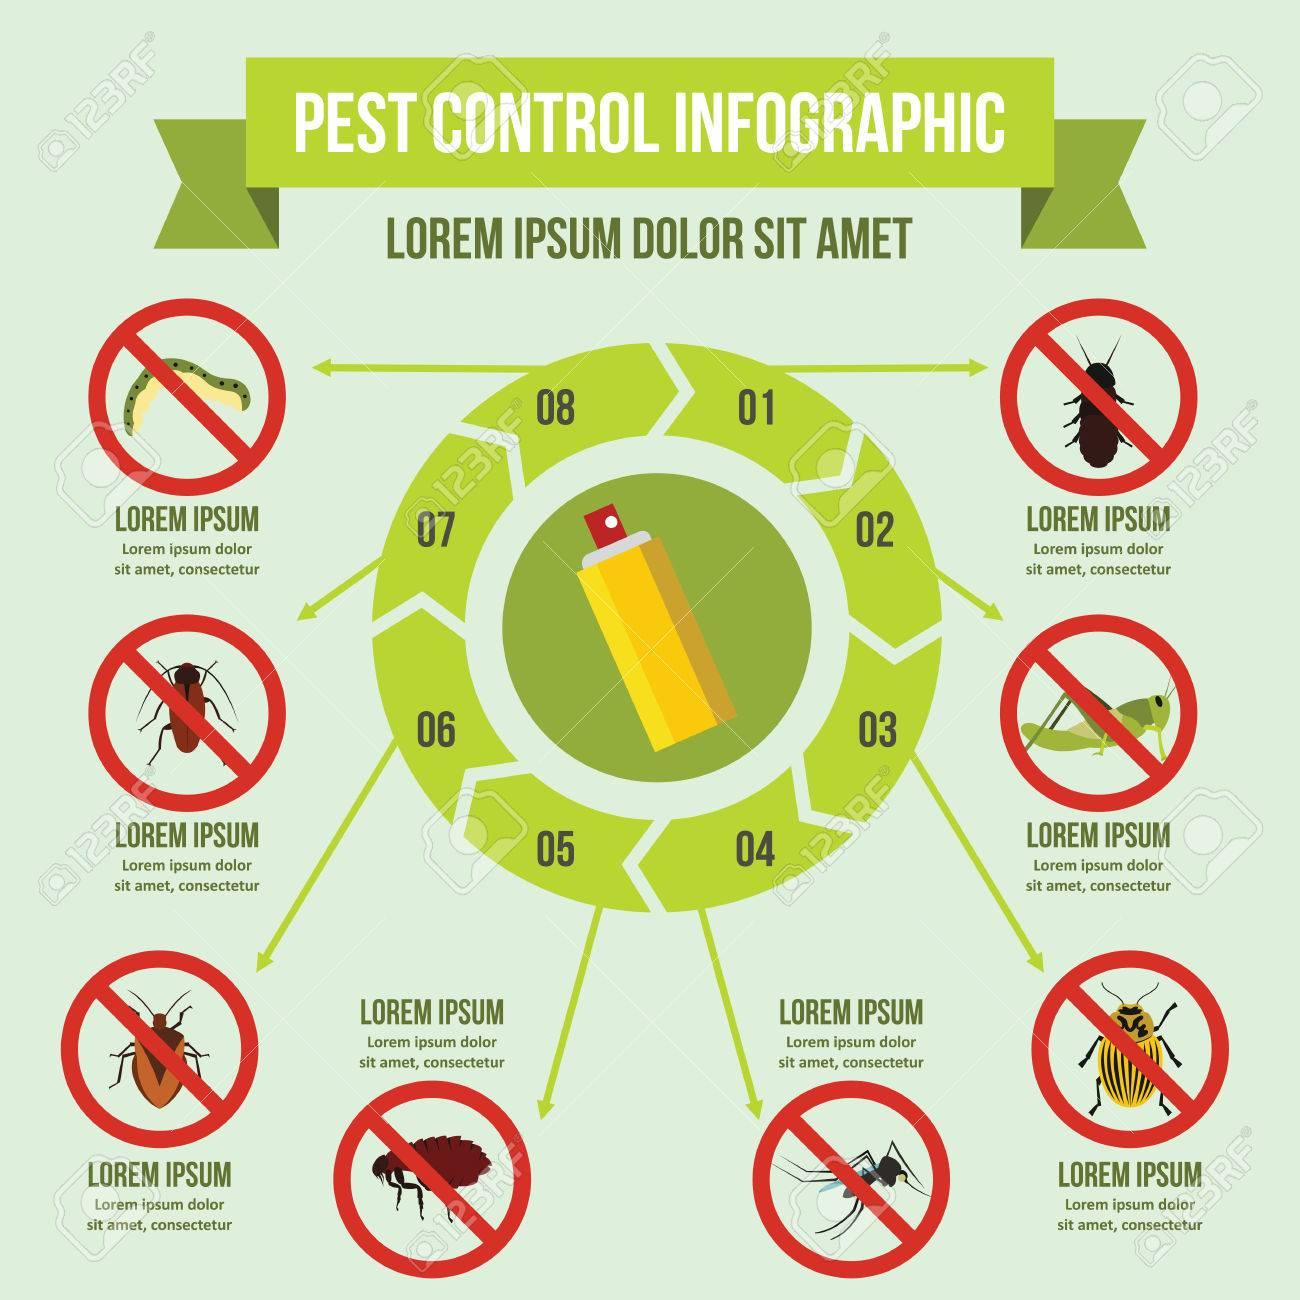 80793372-pest-control-infographic-concep